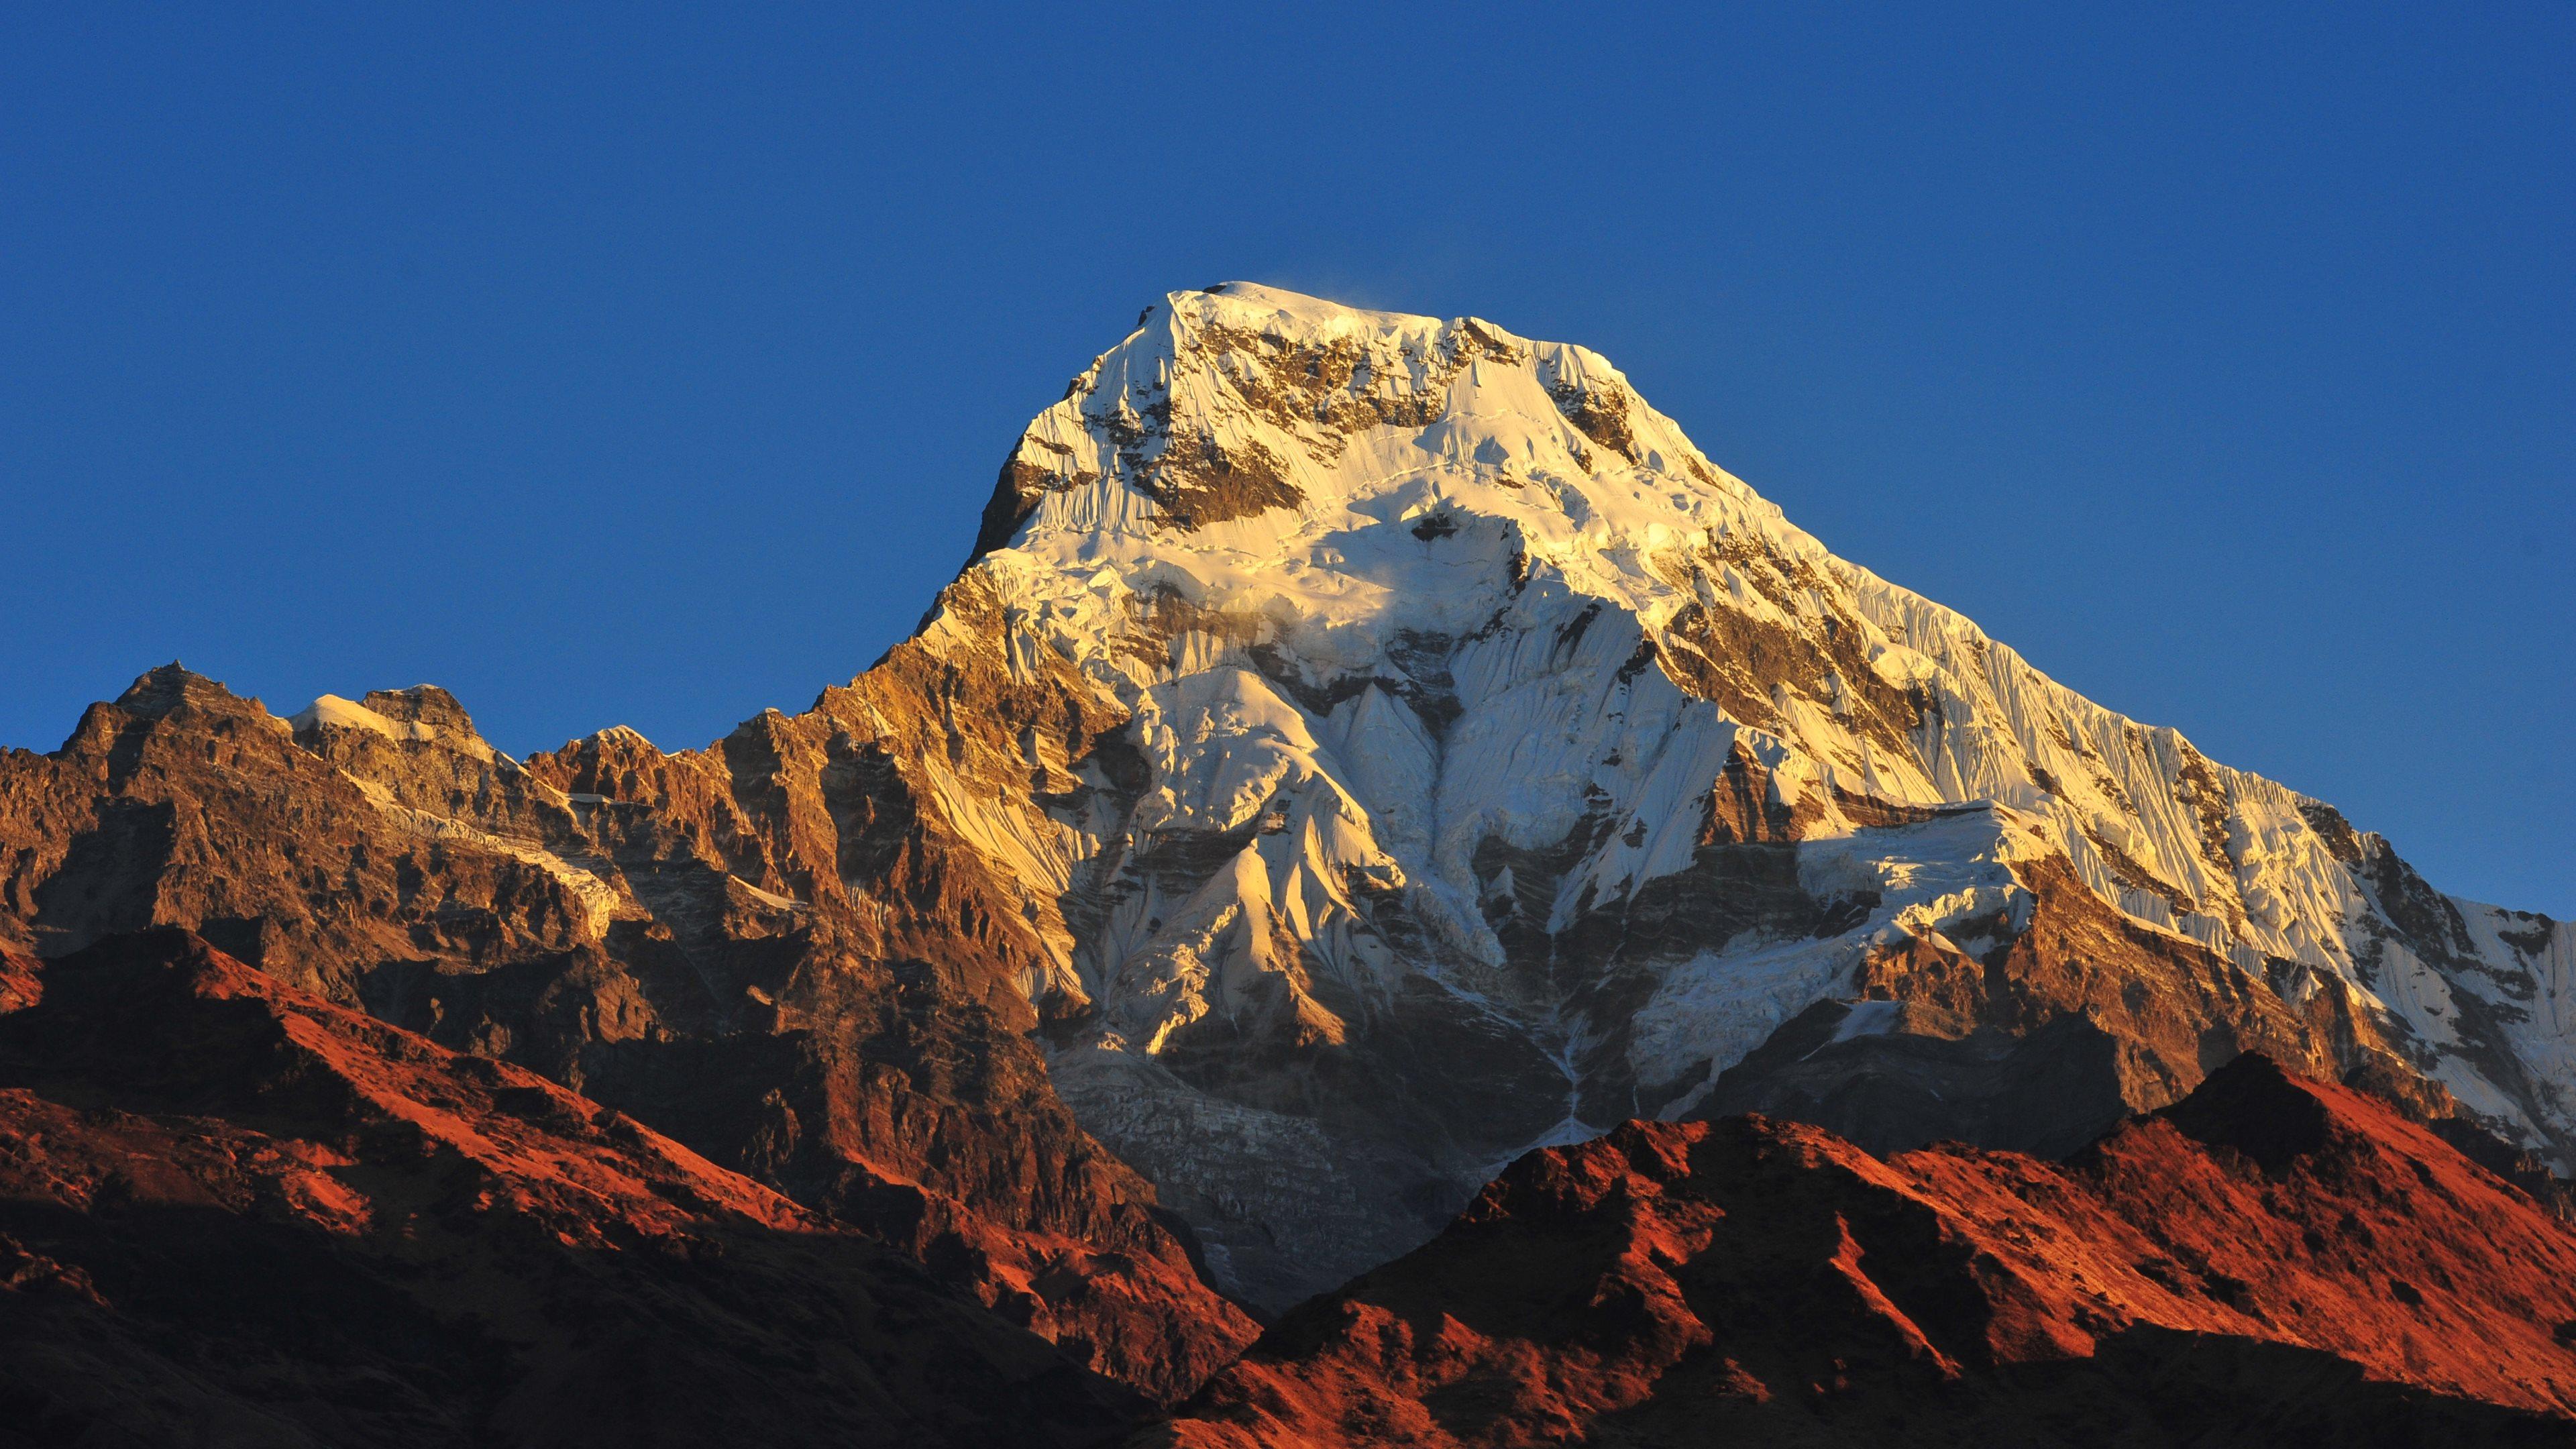 4k mountain wallpaper - photo #8